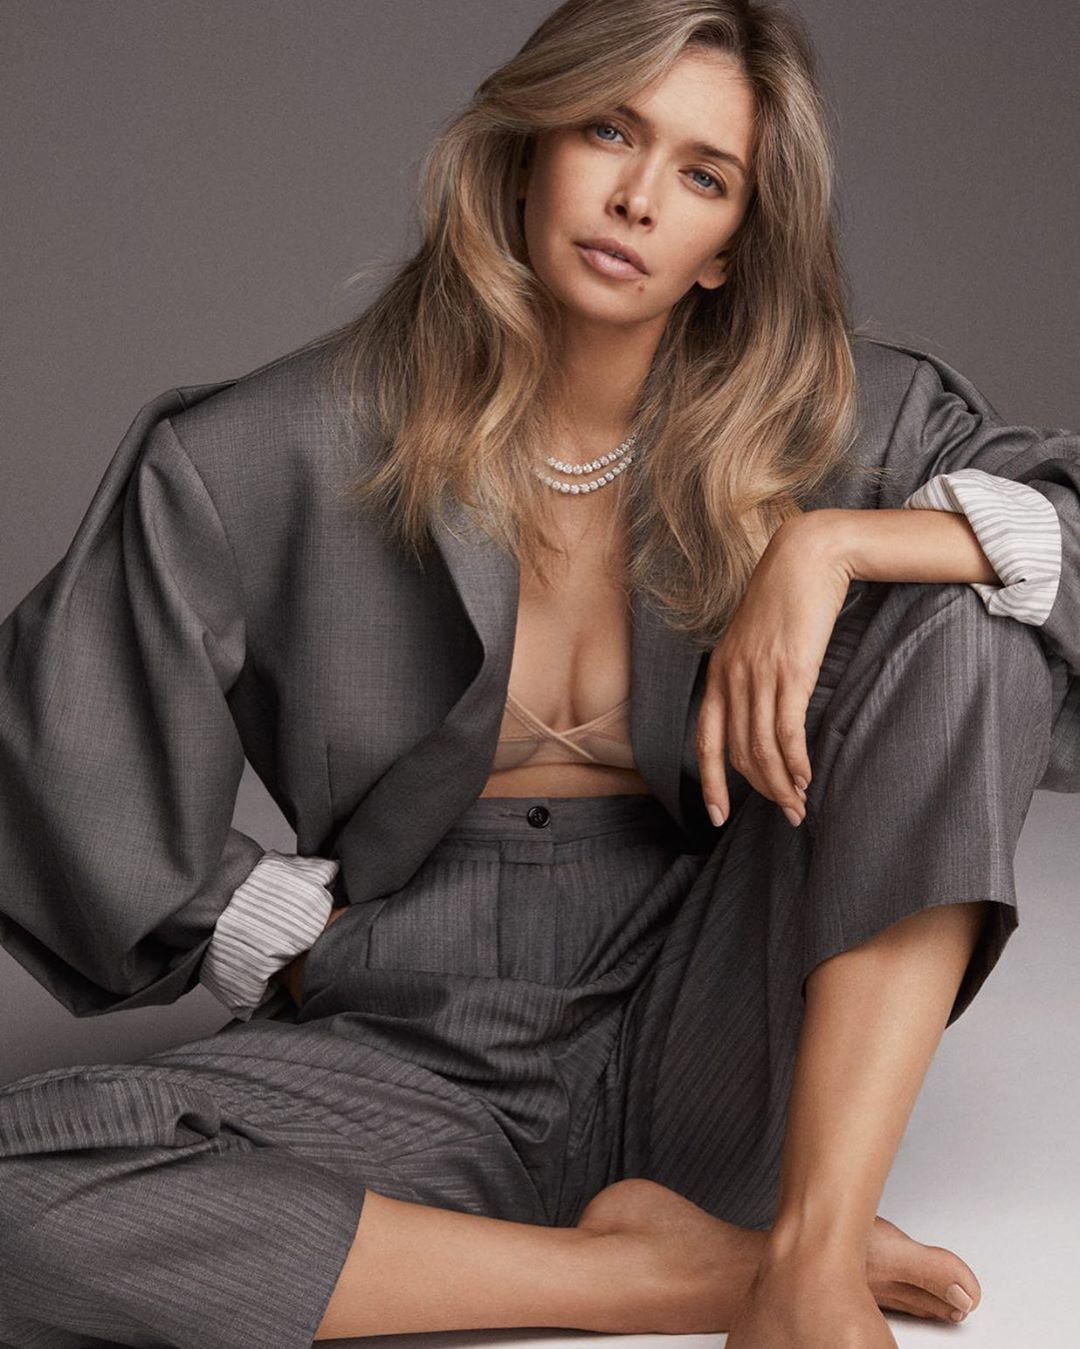 Брежнєва позувала в костюмі оверсайз / instagram.com/ververa